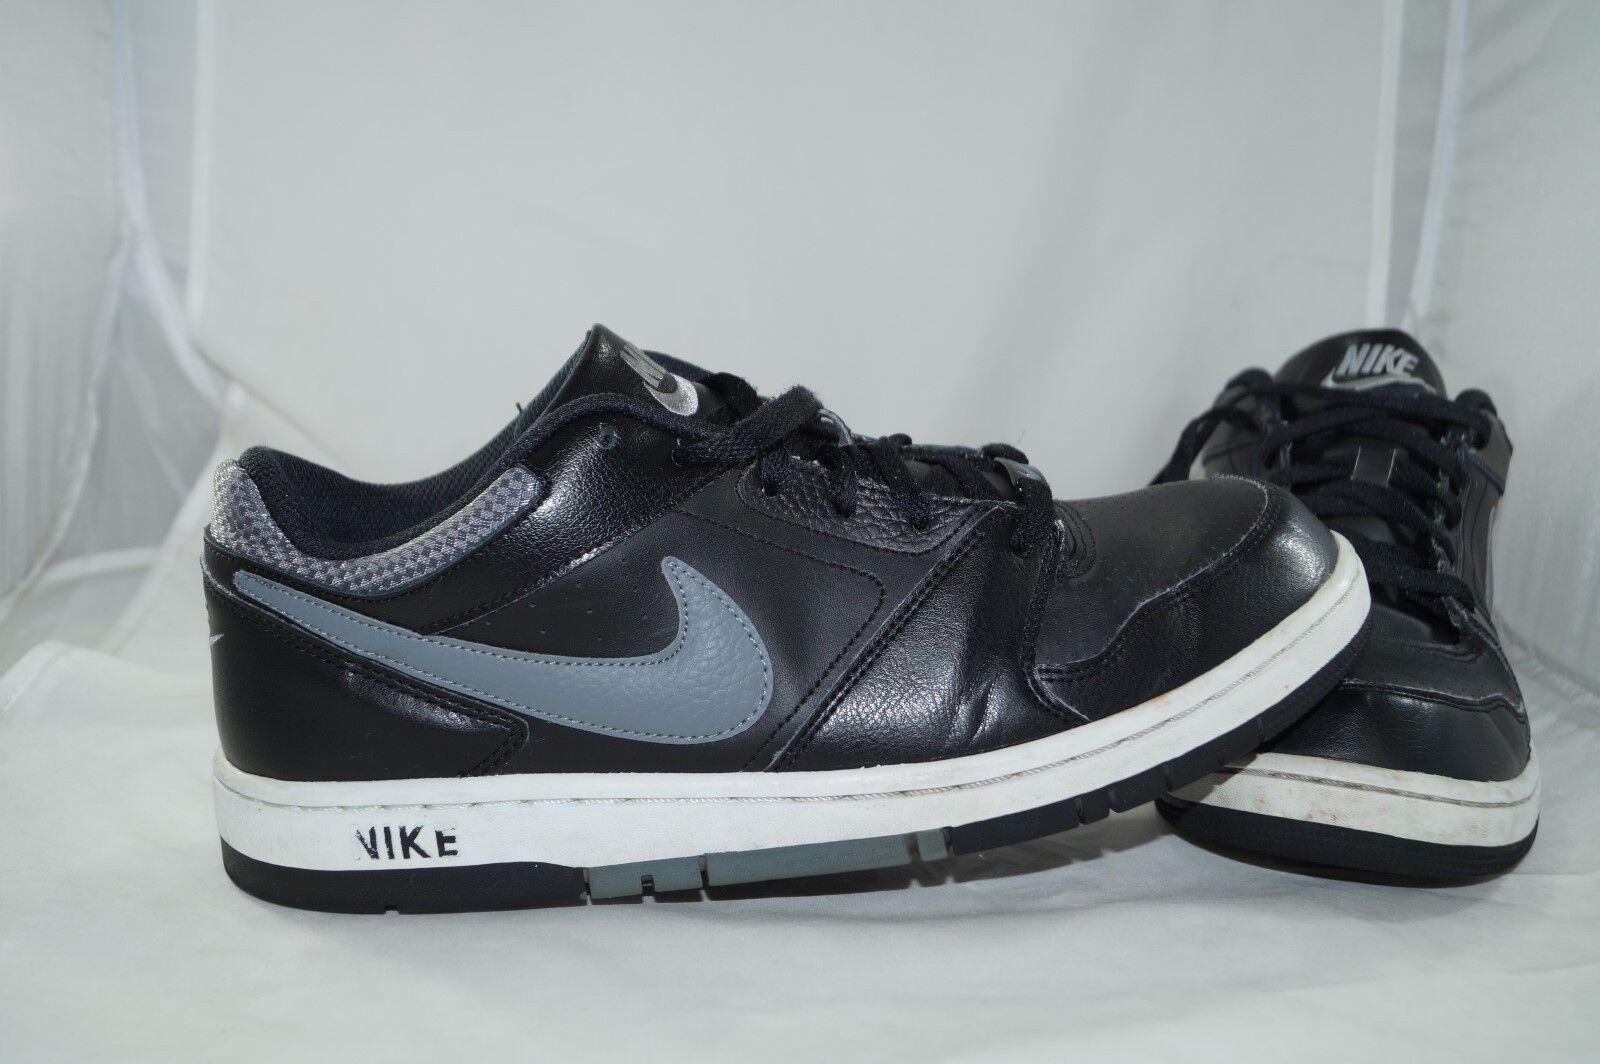 Nike Air Prestige IV 4 Low tops 44,5   US 10,5   UK 9,5 Sportschuhe